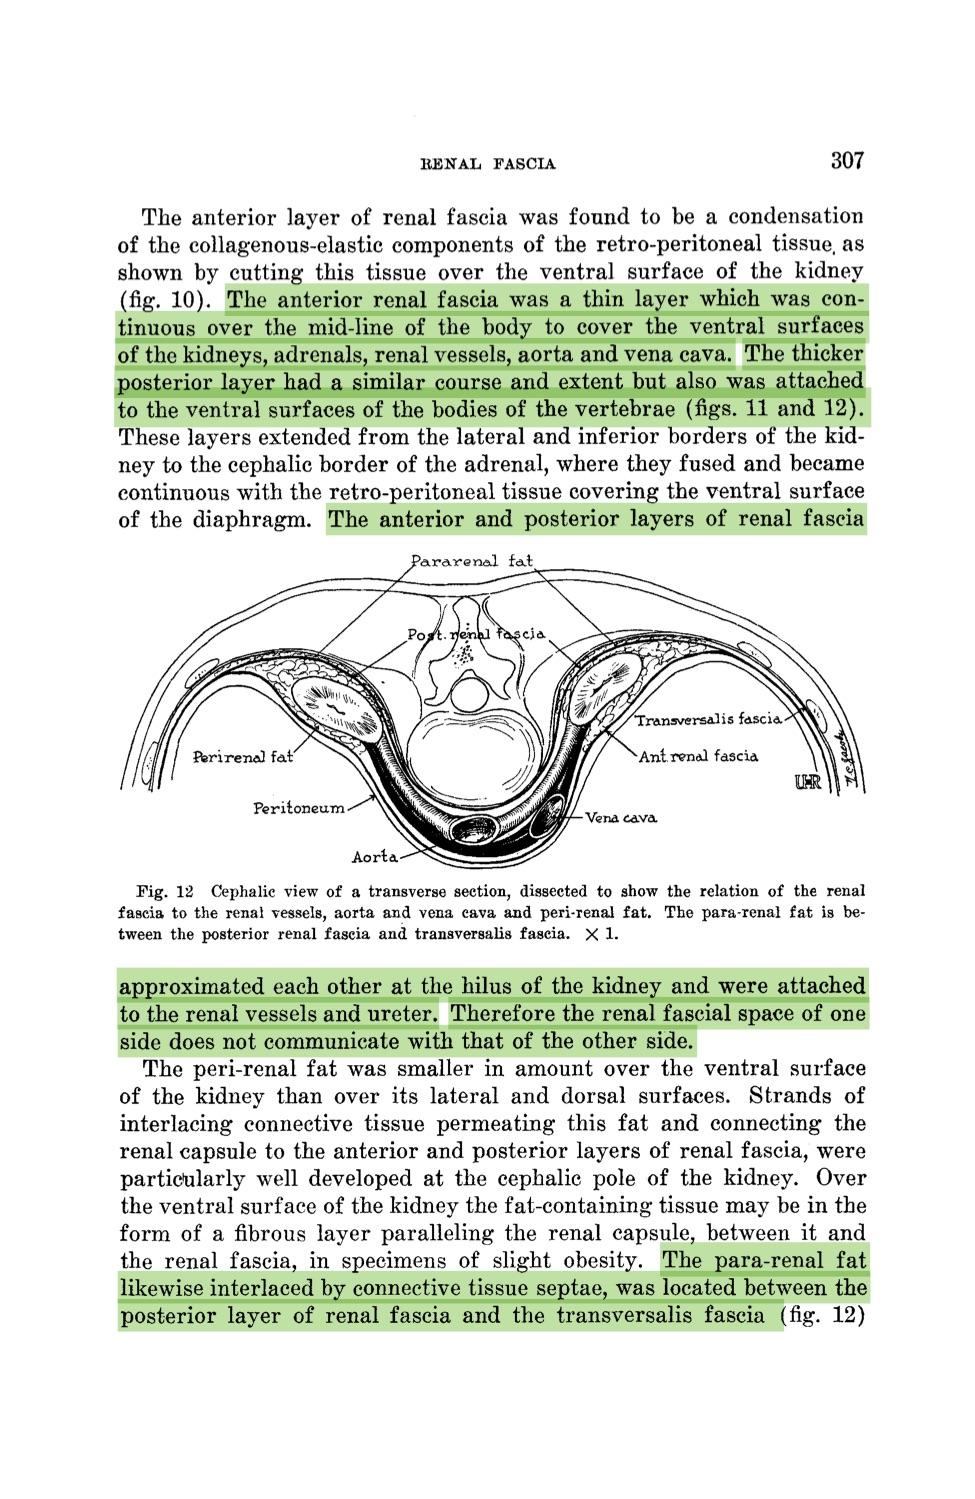 Cuadernos de Anatomía Quirúrgica: The renal fascia and its relation ...